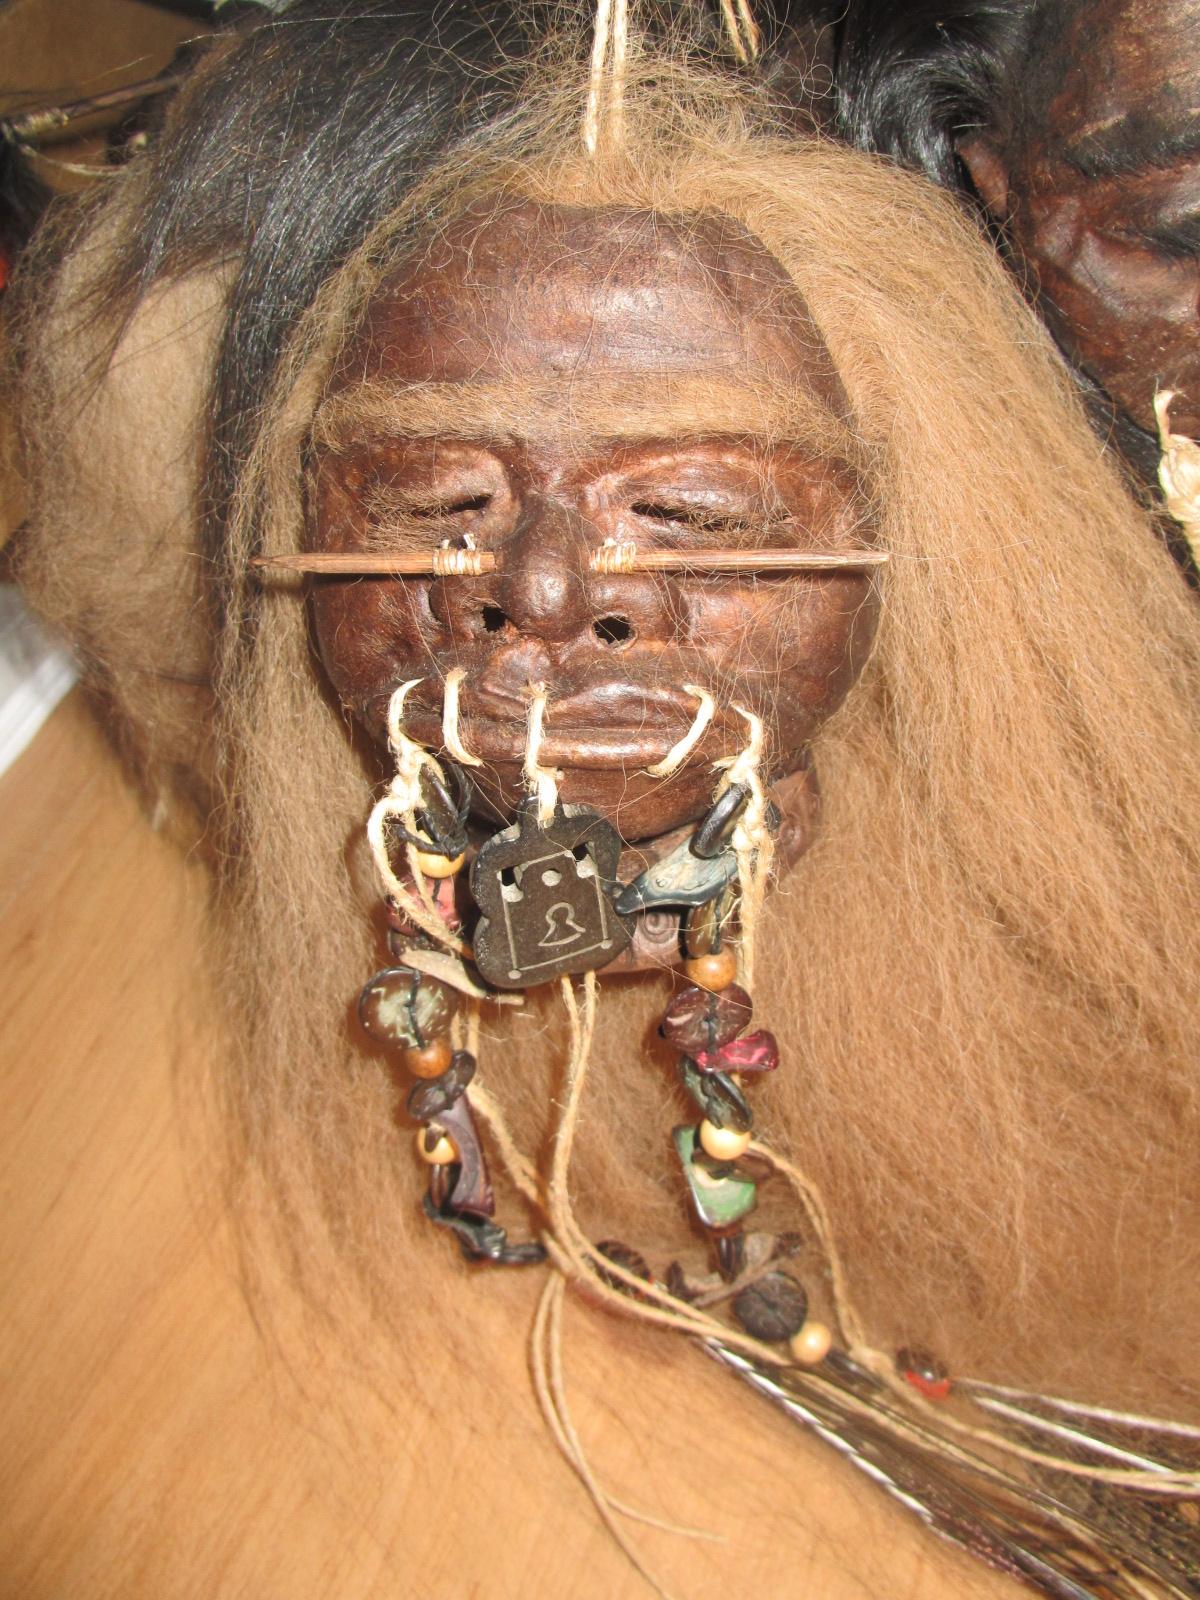 Shrunken Heads Spectacular Shrunken Head